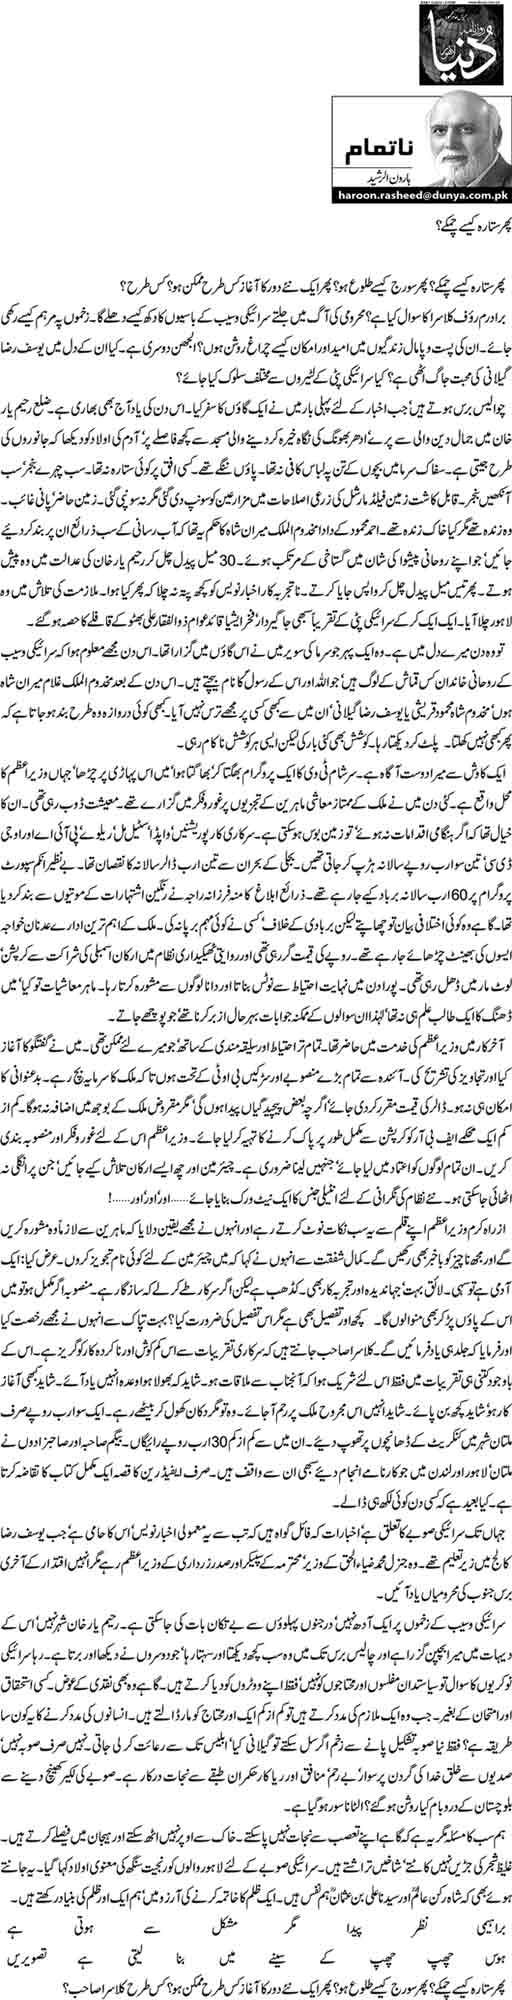 Phir sitara kaisay chamkay - Haroon-ur-Rasheed